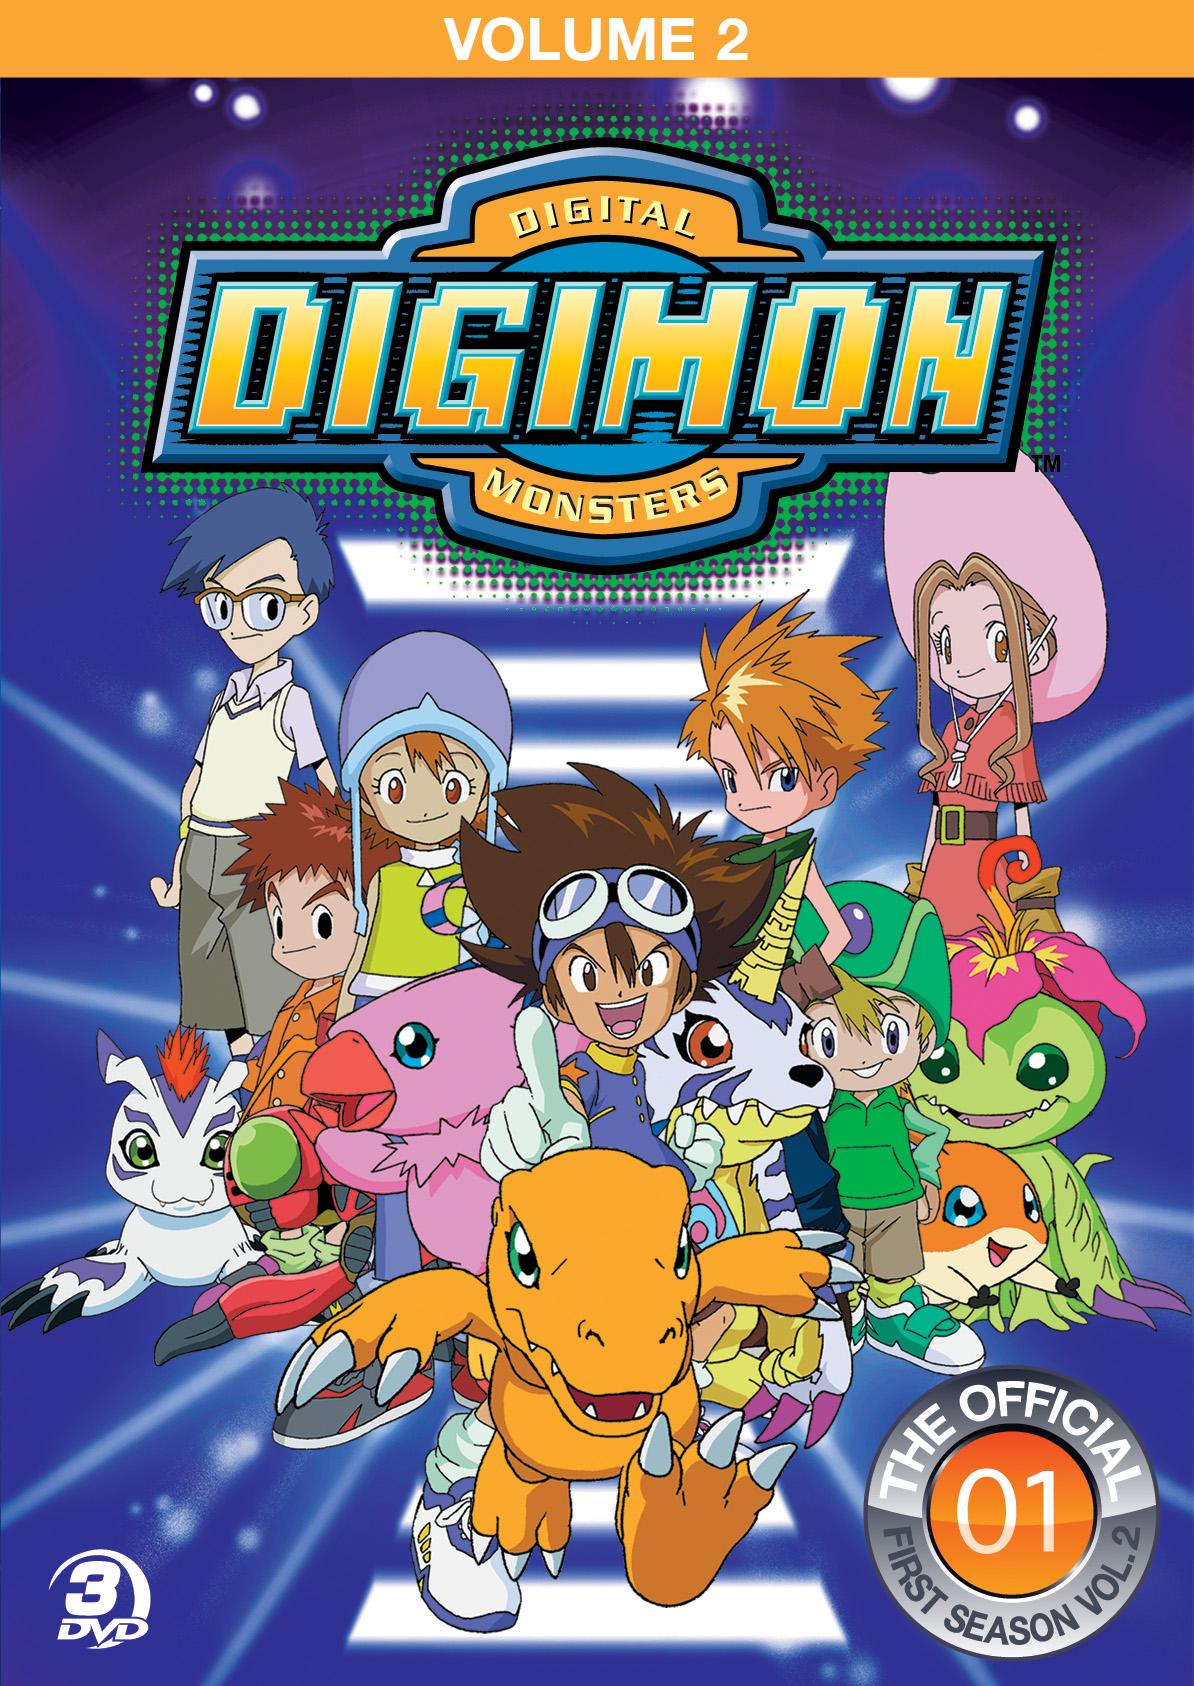 Digimon Season 3 Characters Digimon season 1 volume 2